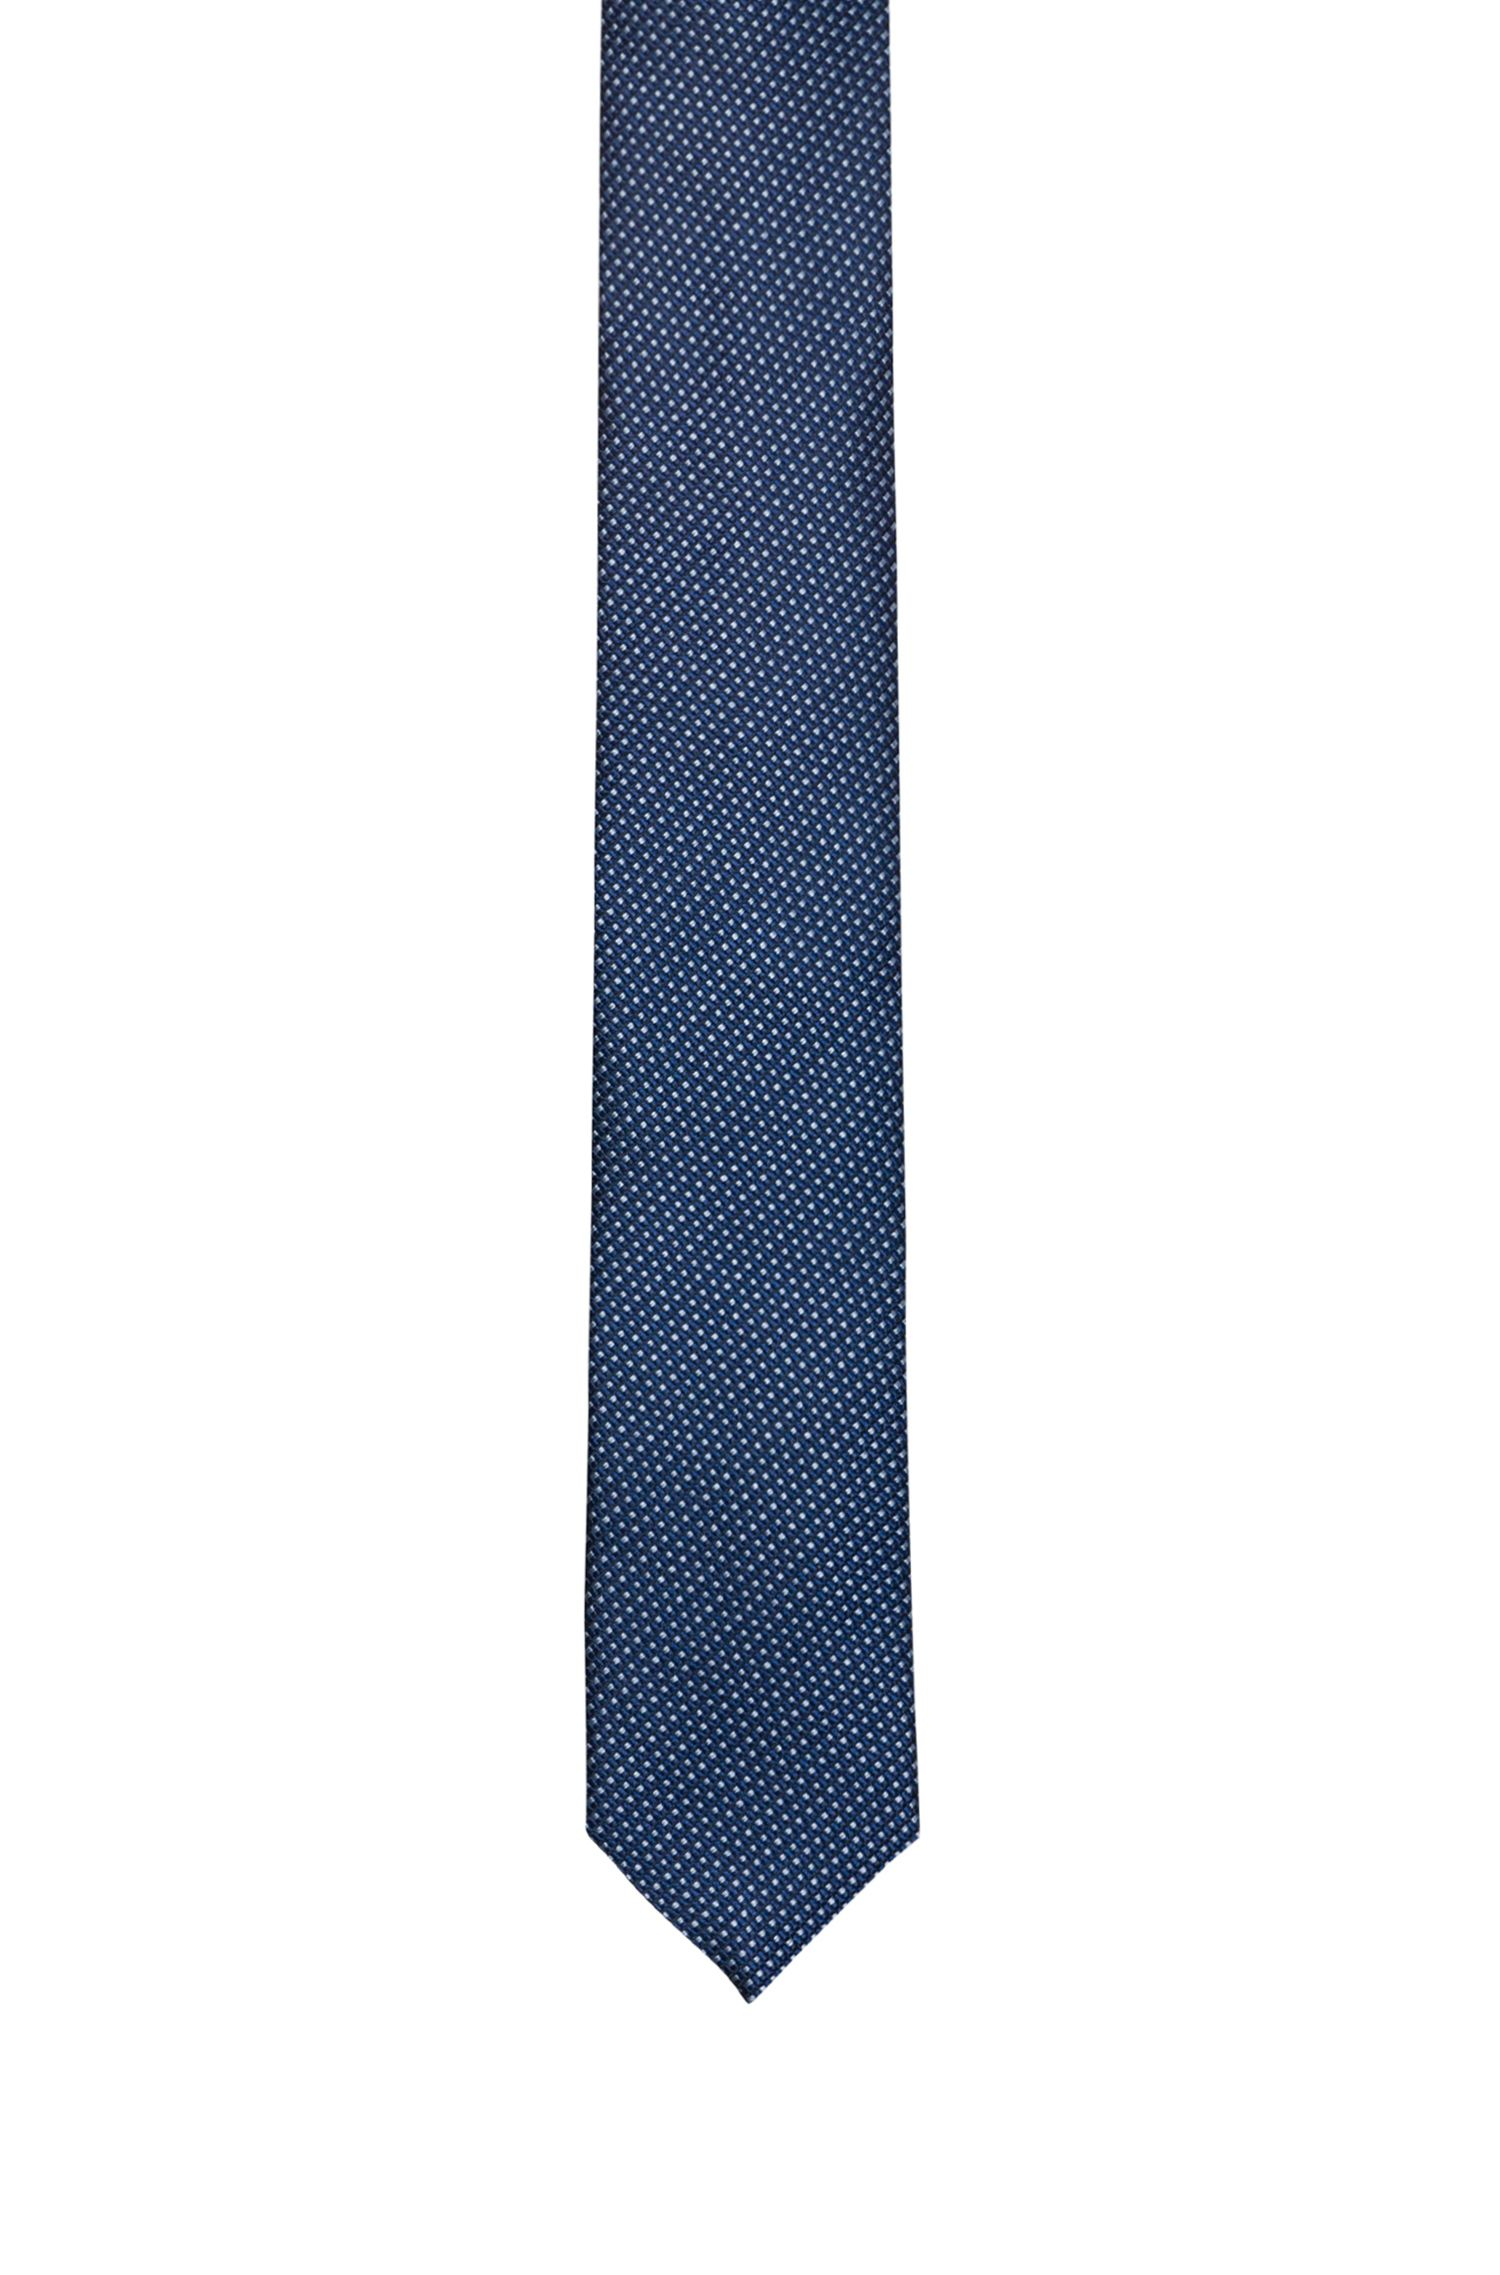 Moderne Krawatte aus gemustertem Seiden-Jacquard